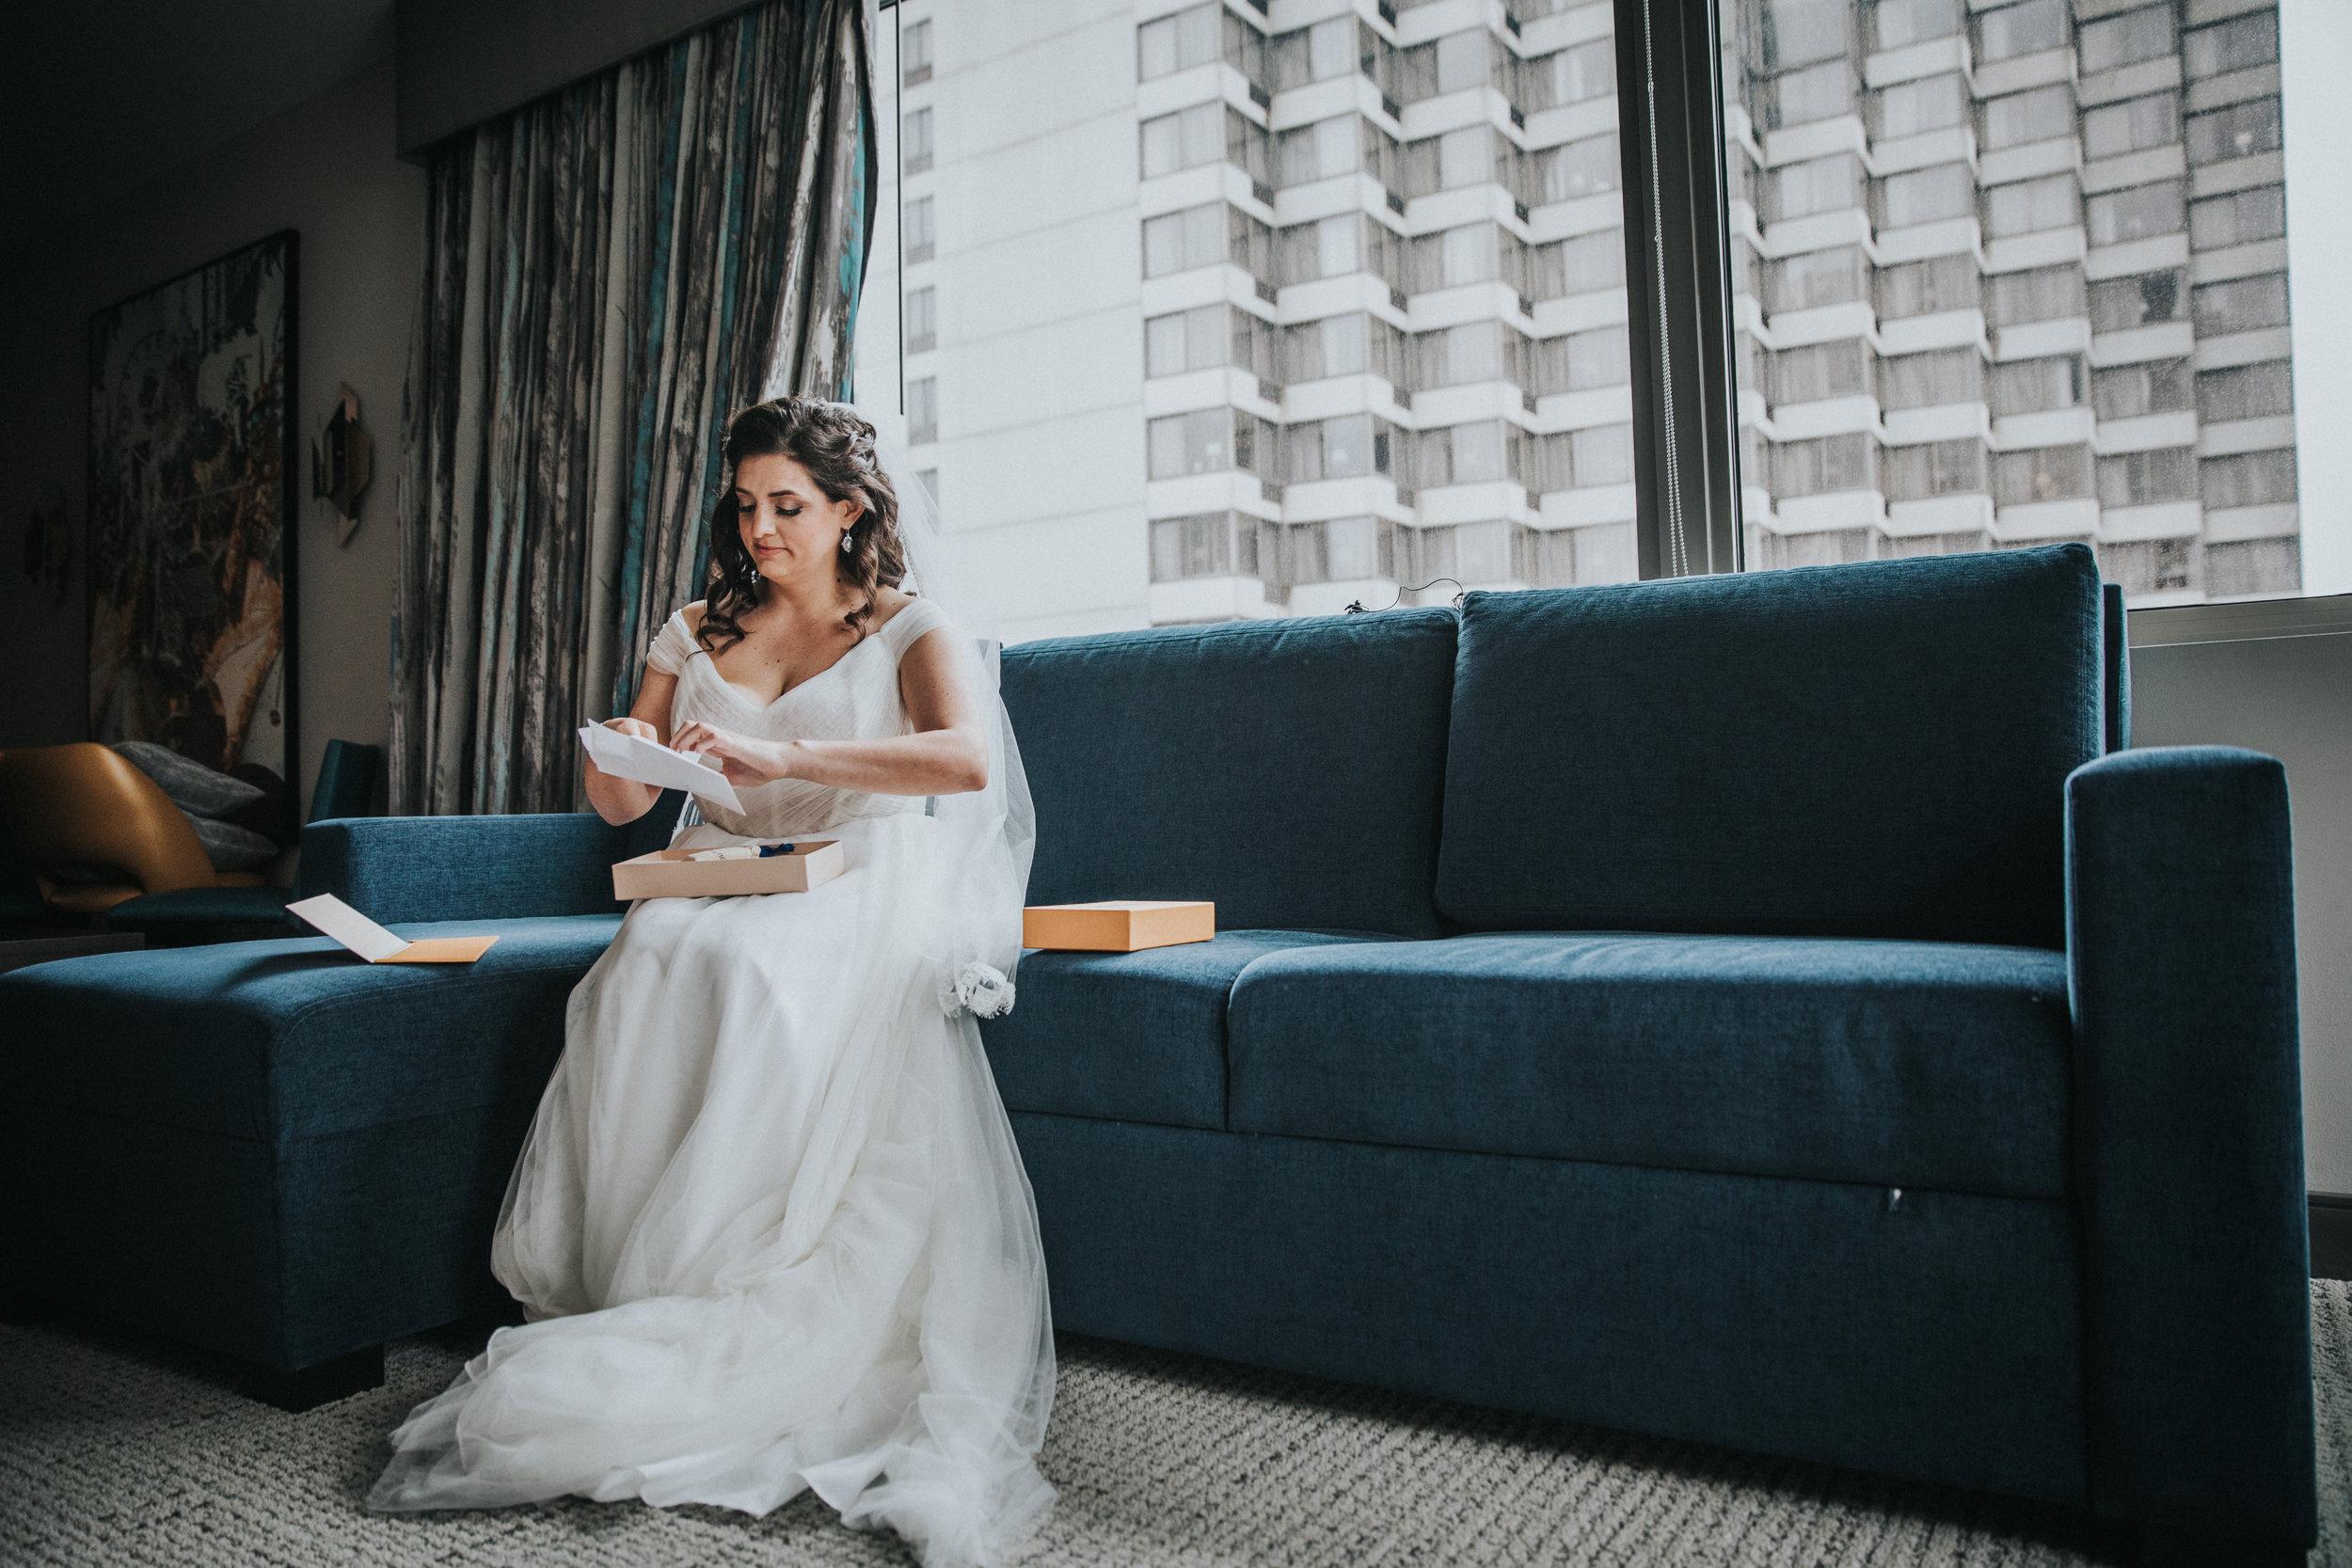 JennaLynnPhotography-NJWeddingPhotographer-Philadelphia-Wedding-ArtsBallroom-GettingReady-78.jpg